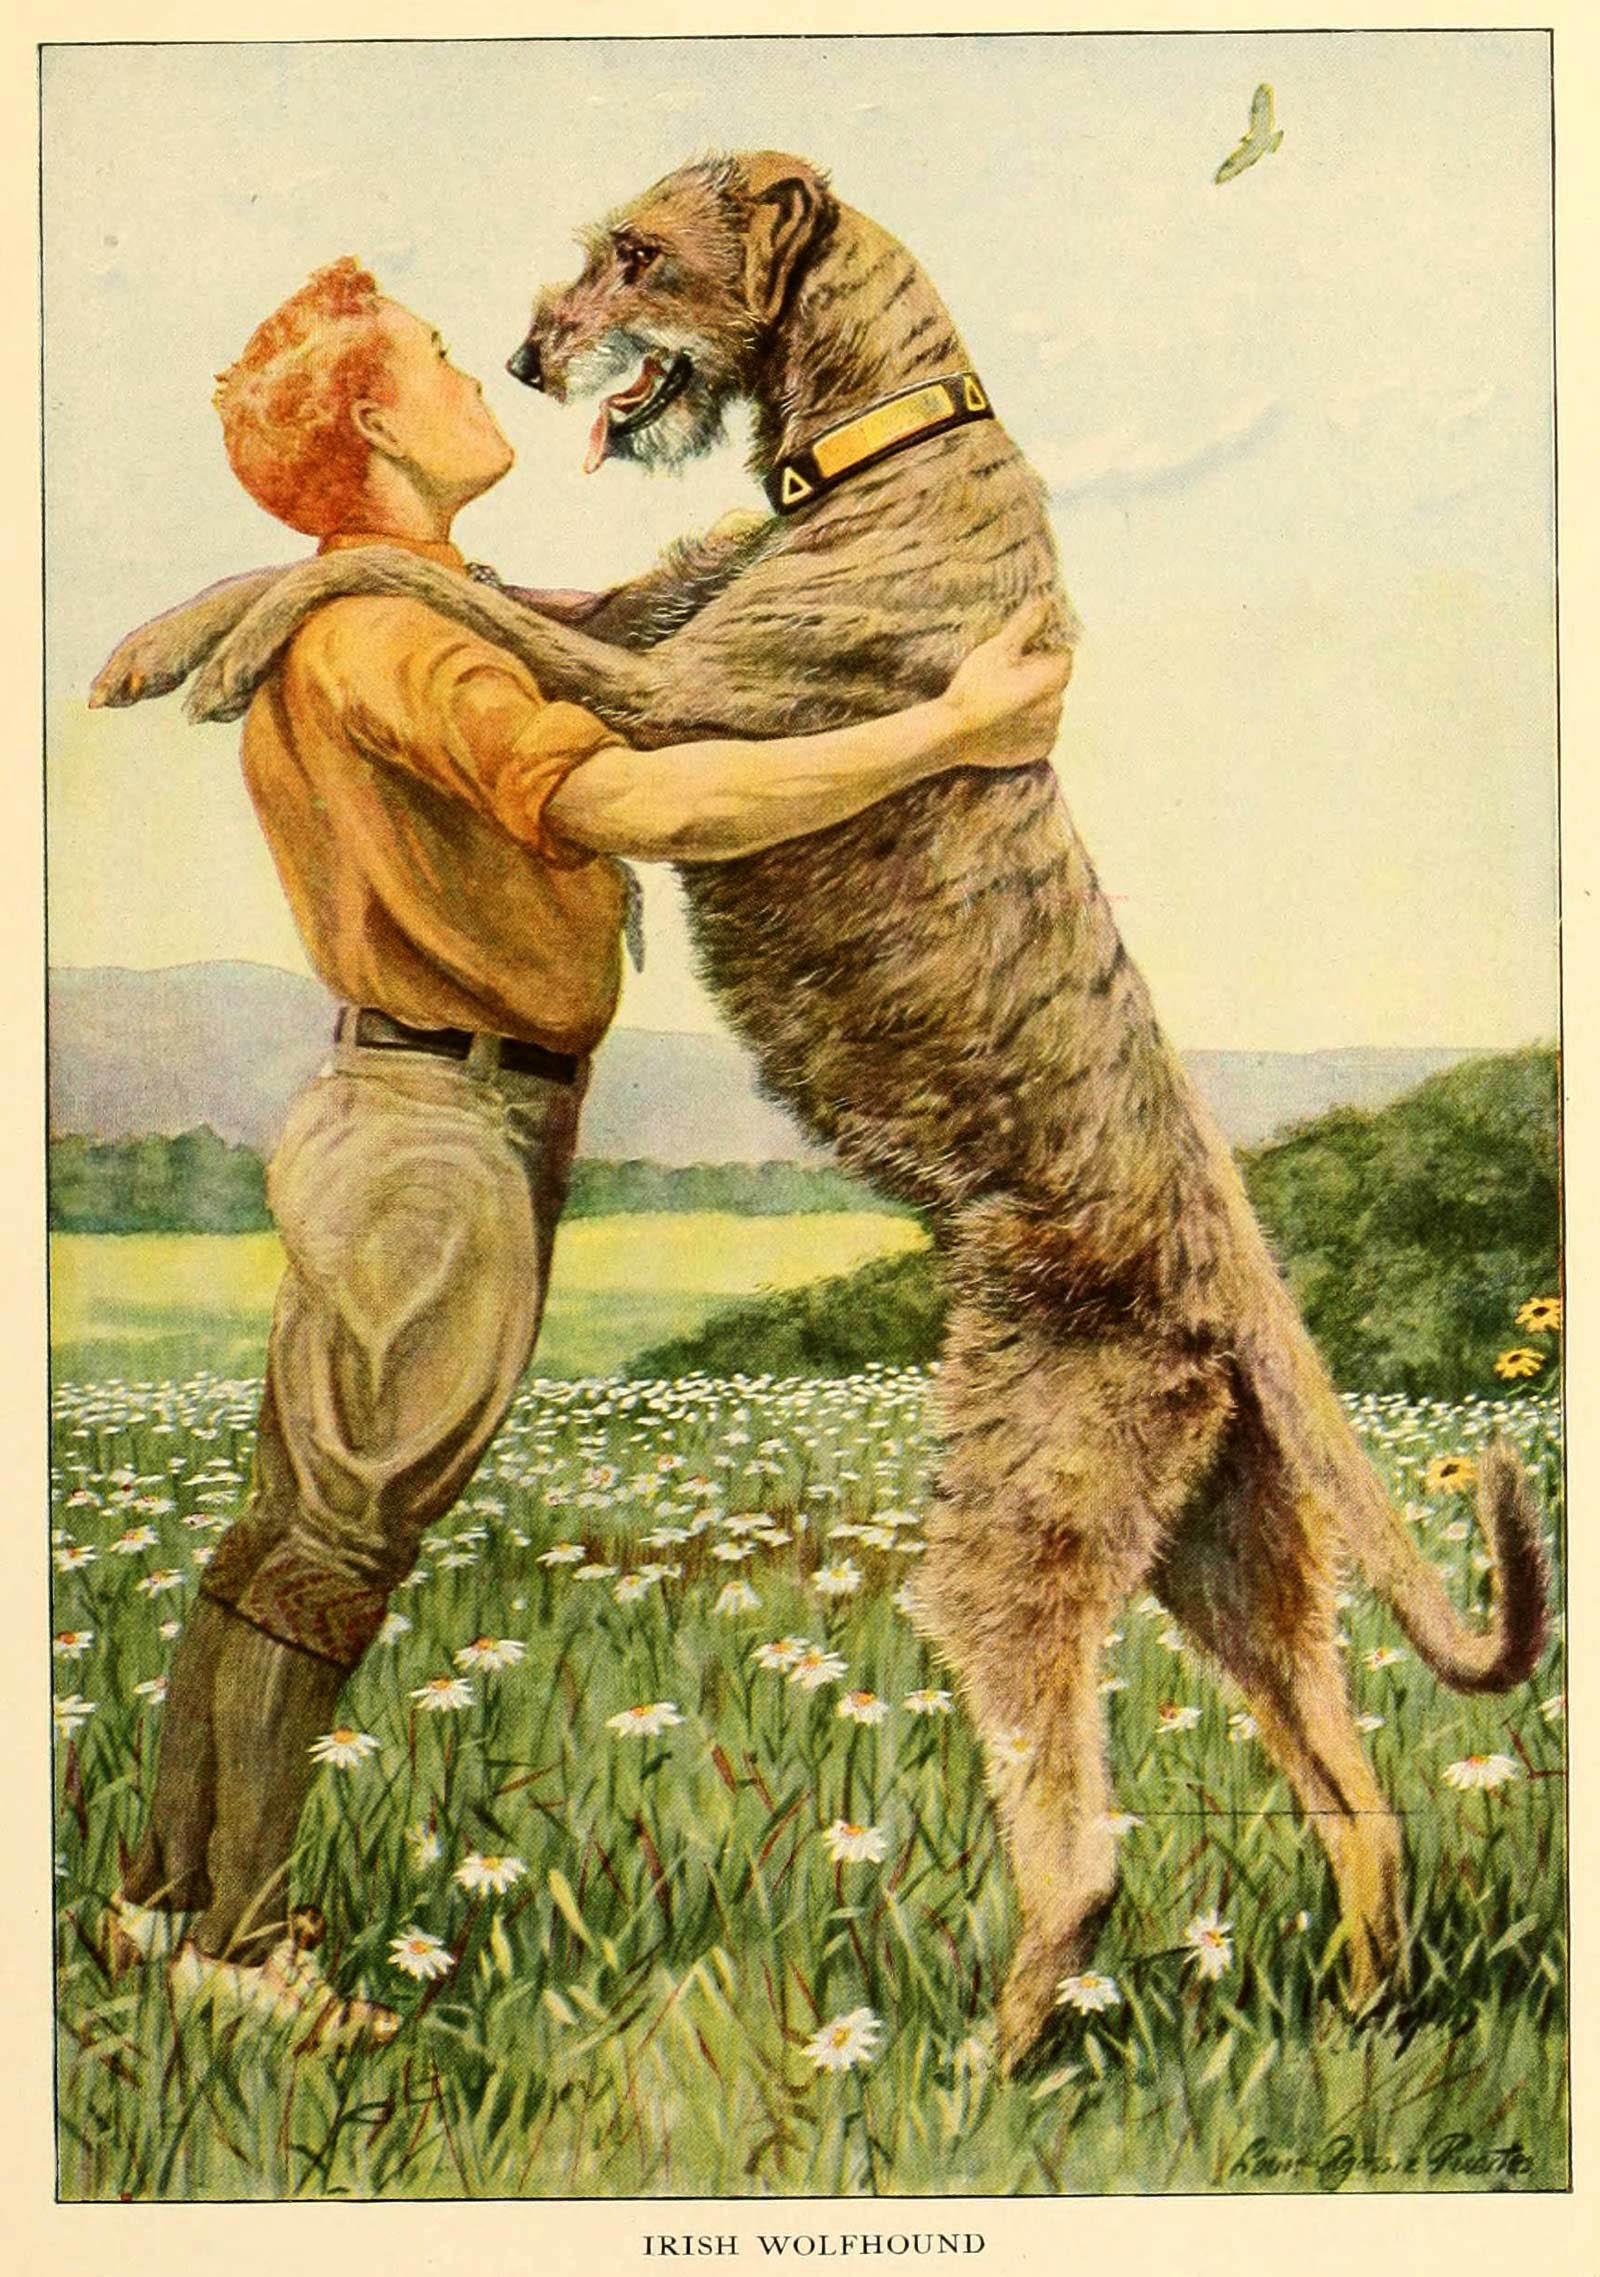 Irish Wolfhound – Information About Dogs